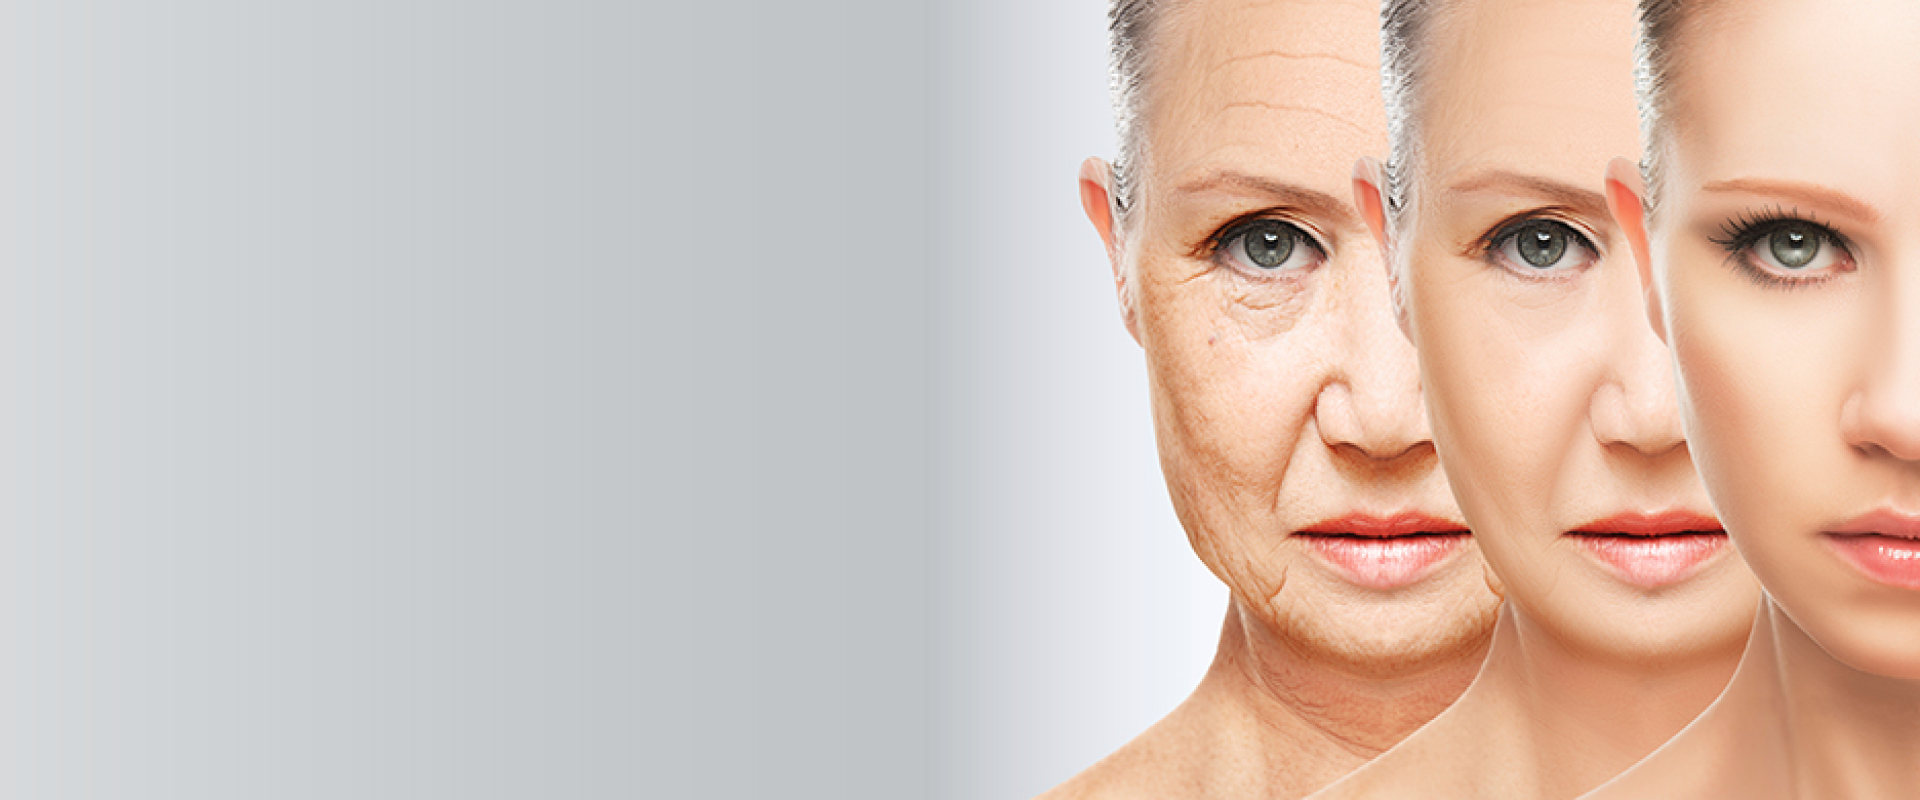 Ringiovanimento viso con PRP